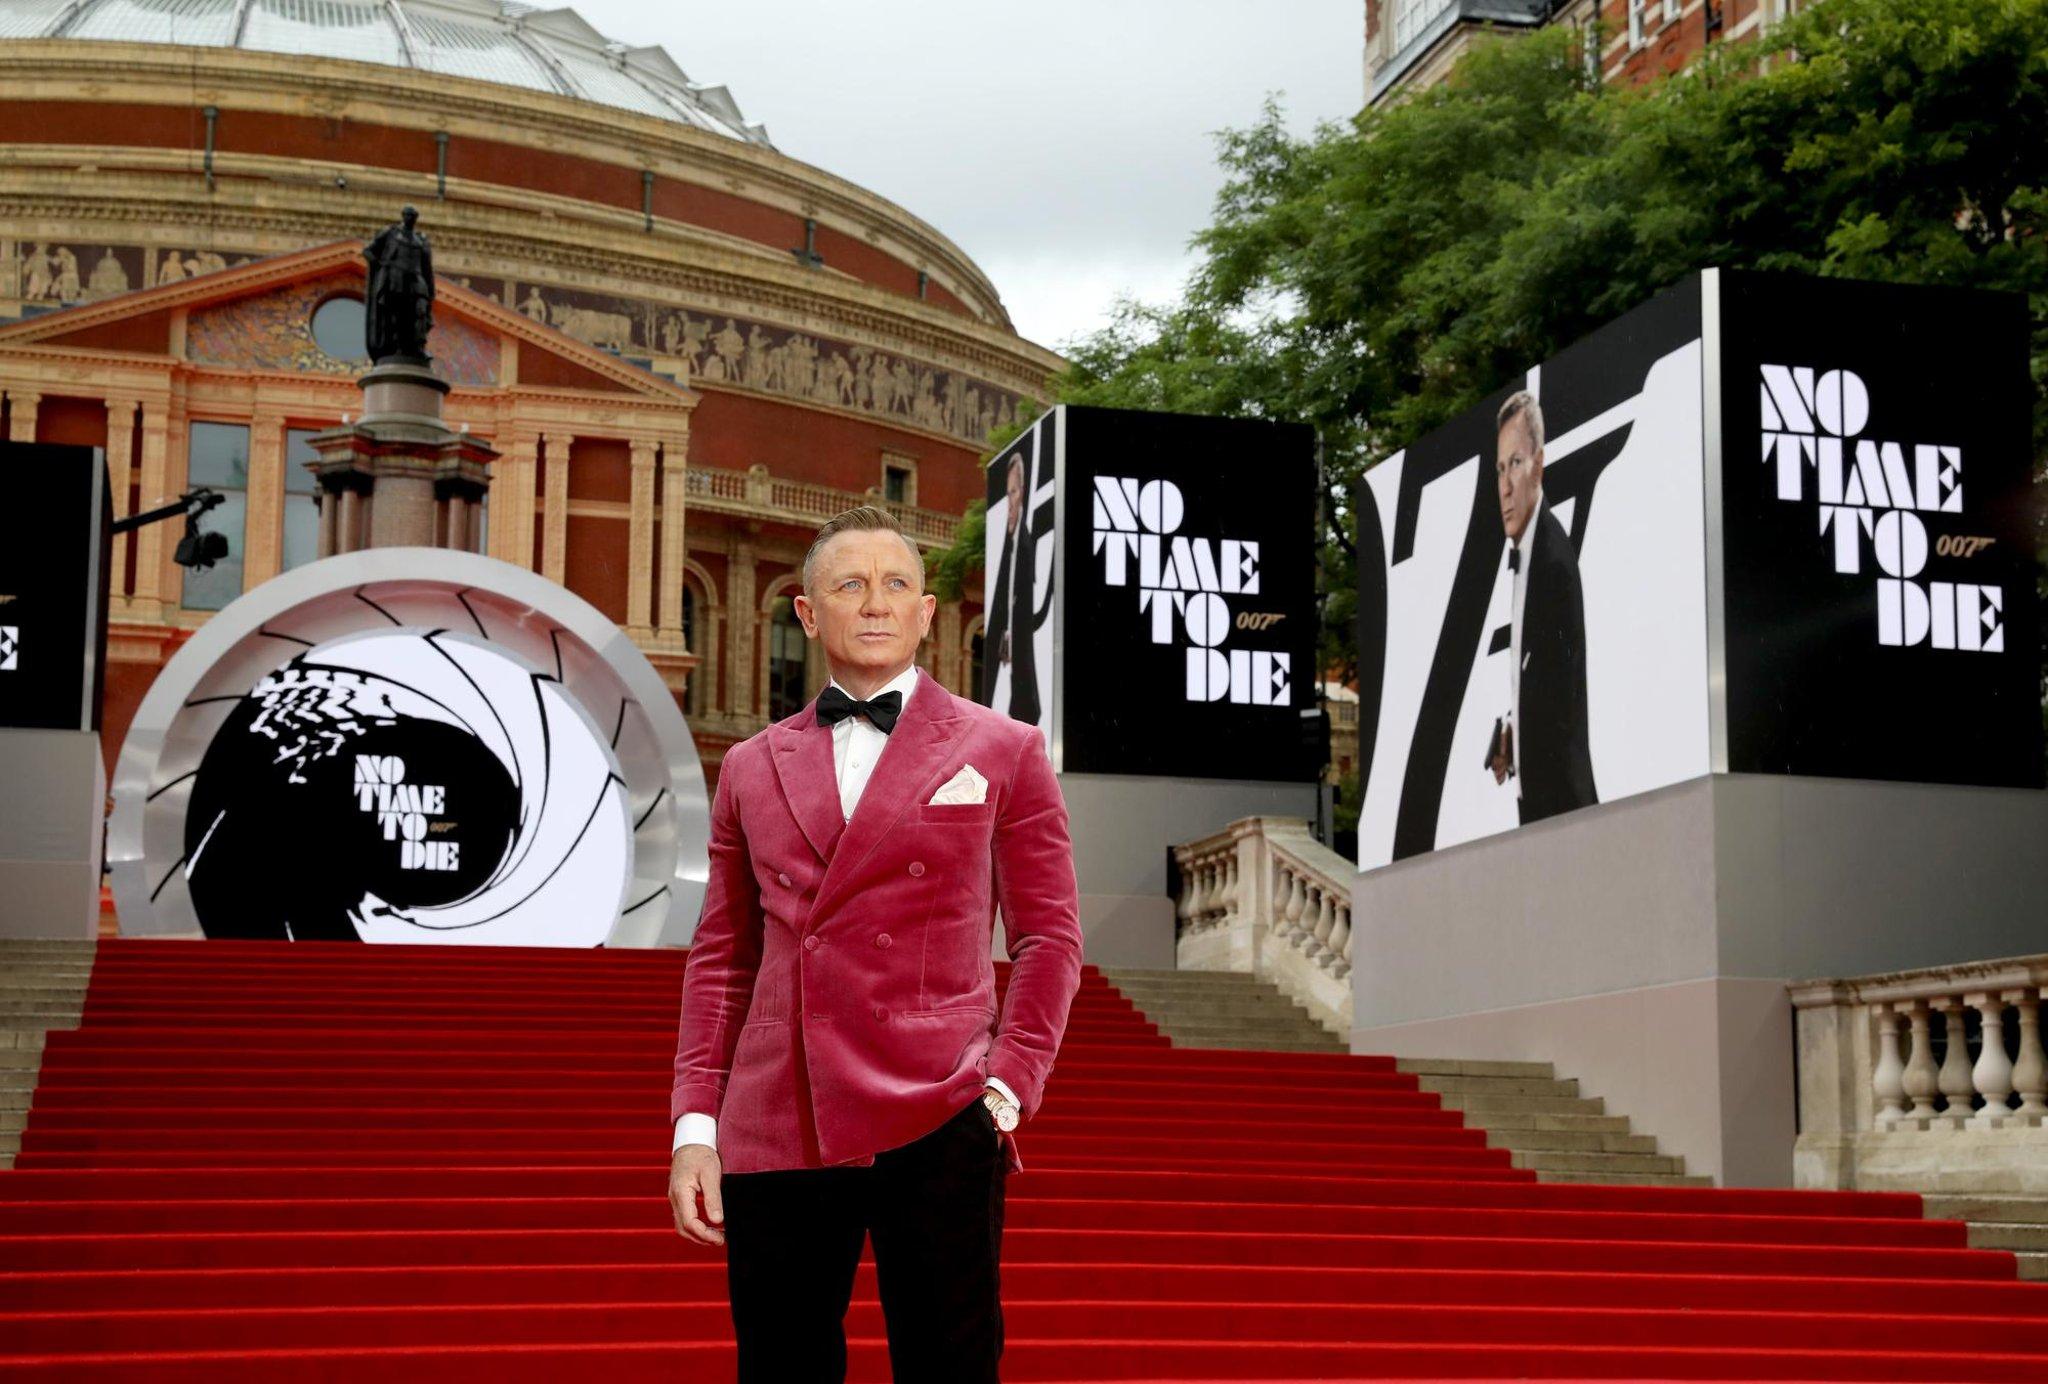 No Time To Die: Lagu Bond Daniel Craig akhirnya tiba untuk membantu menyelamatkan industri perfilman